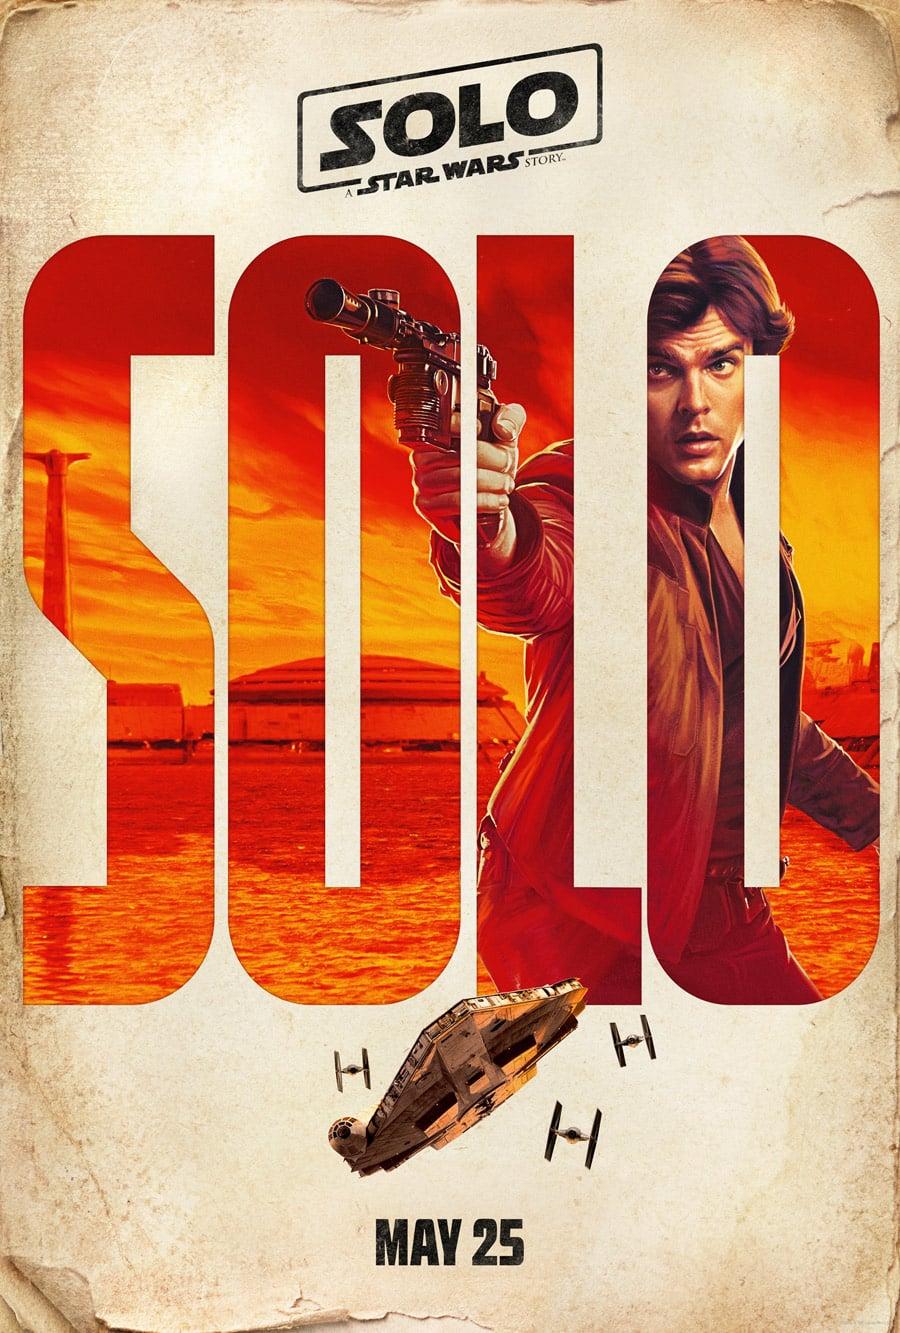 Solo: A Star Wars Story; Zdroj: starwars.com